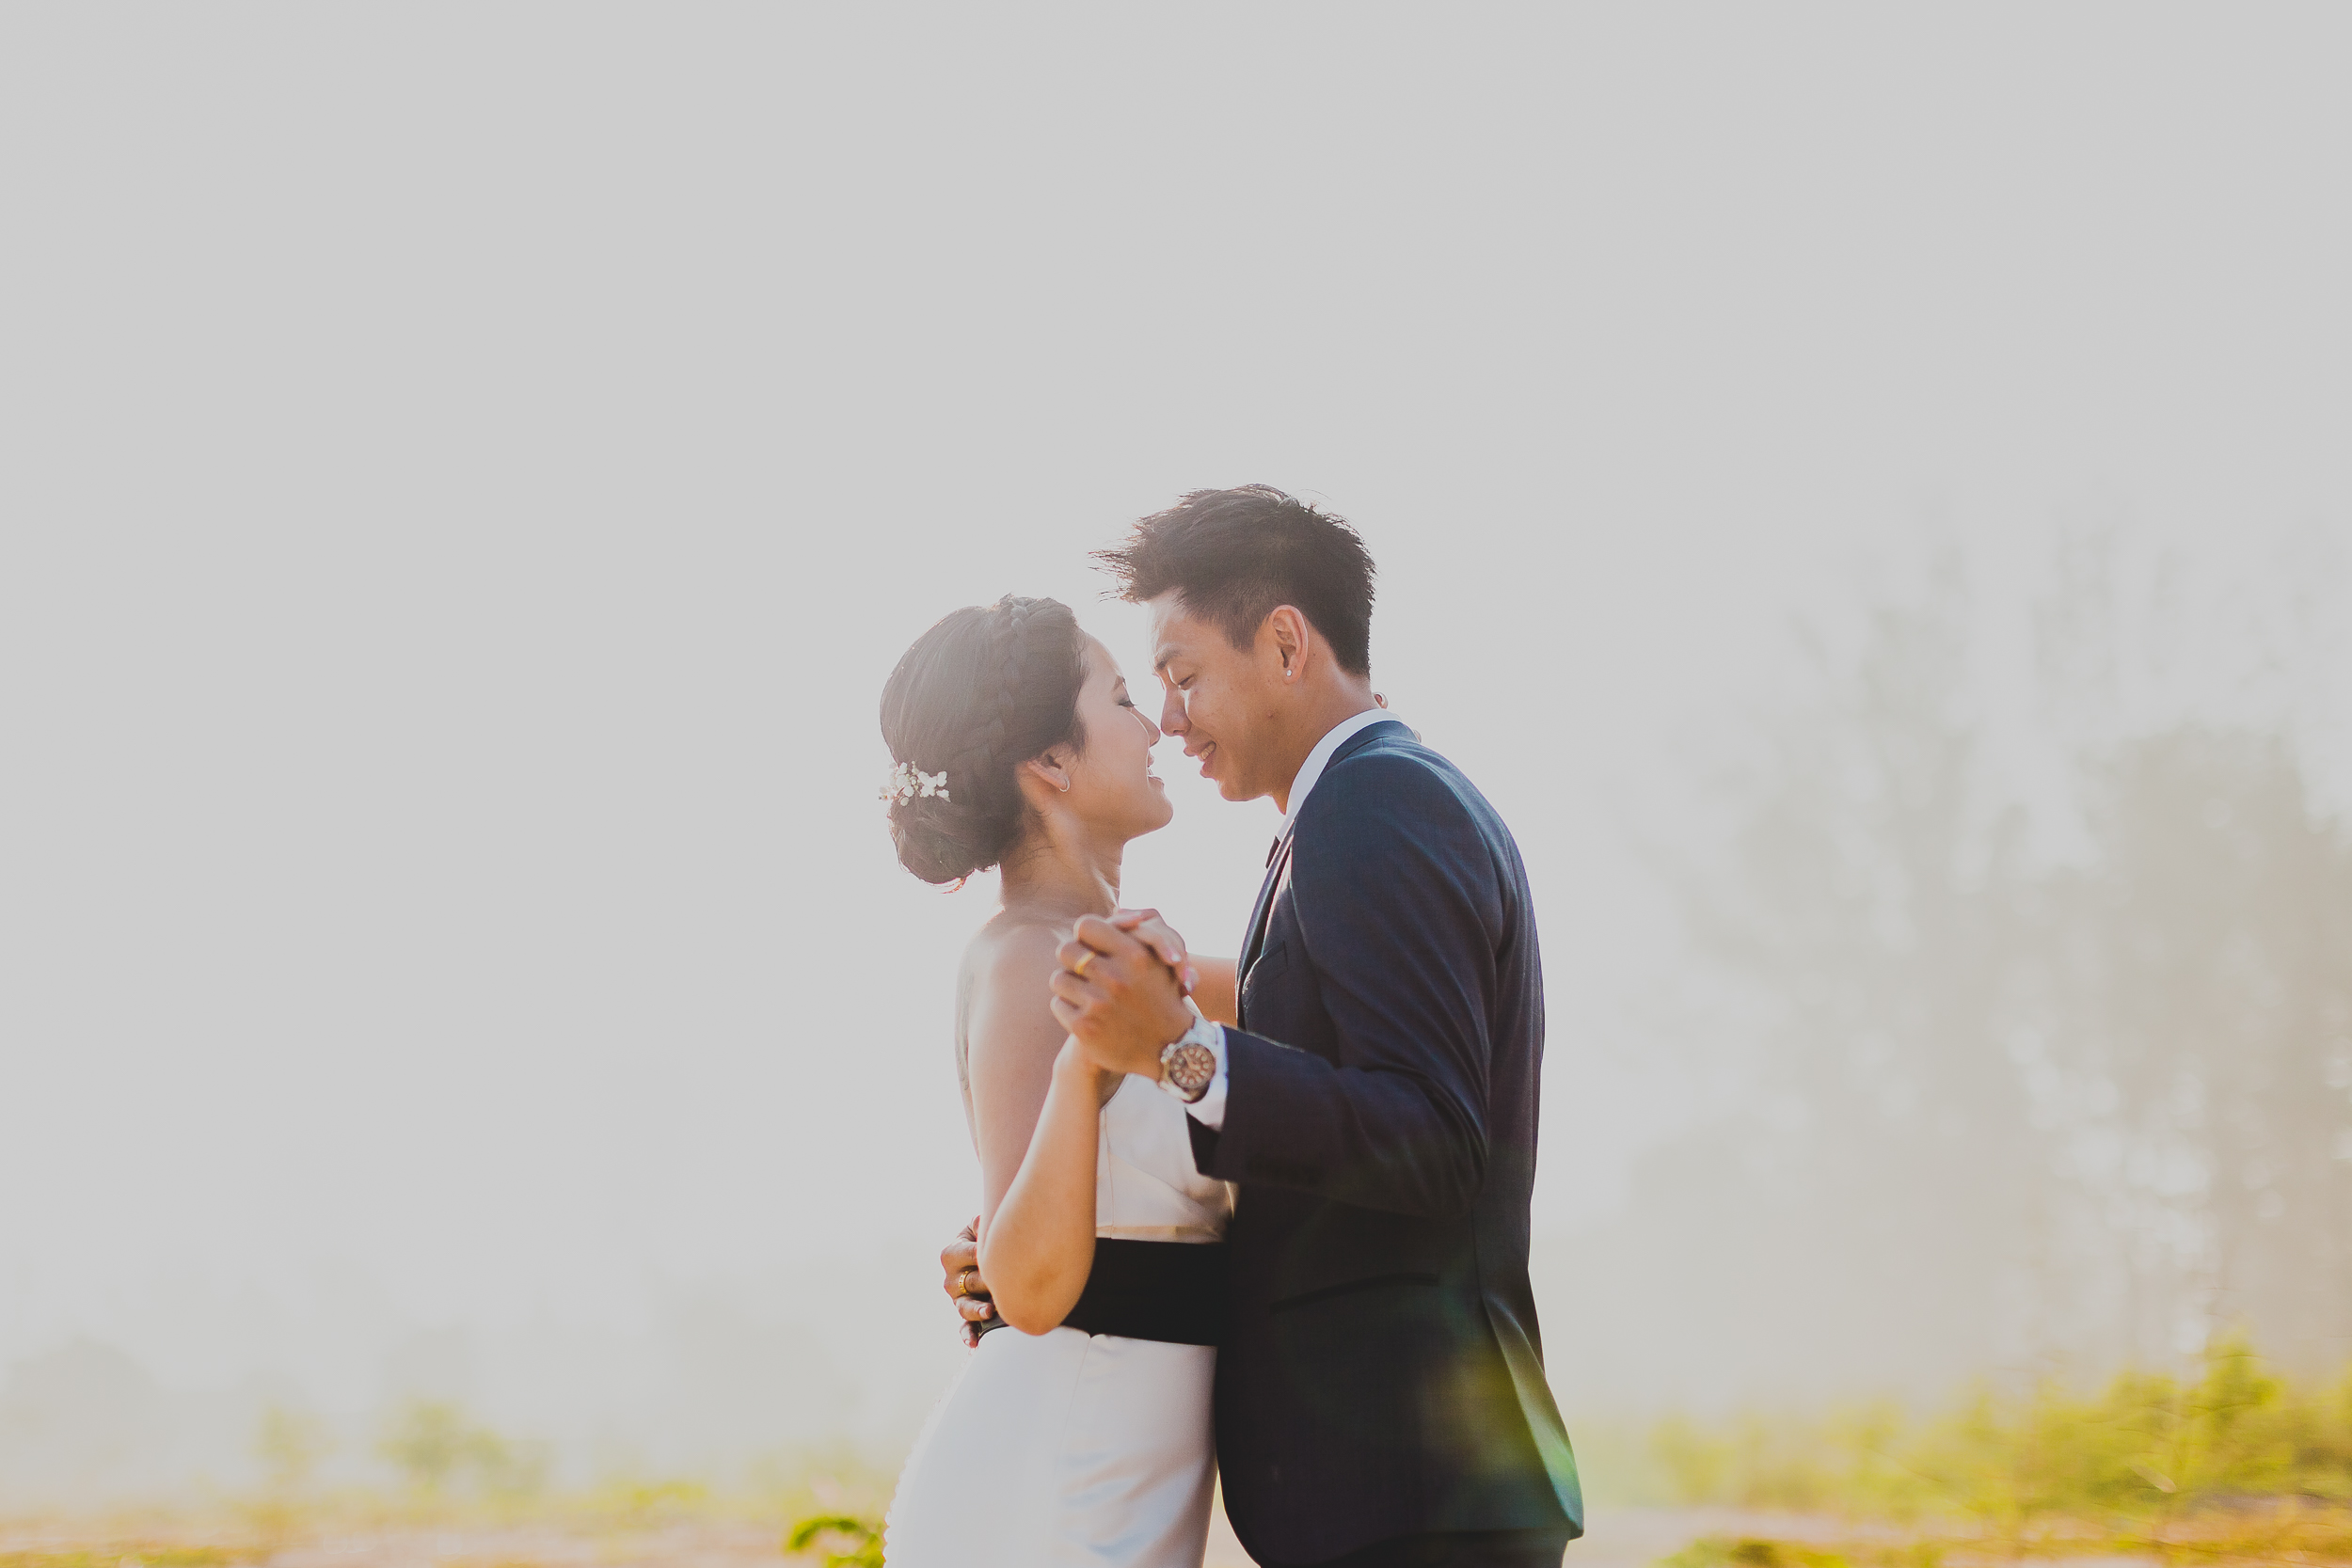 Singapore+Pre+Wedding+Photographer+Ziyang+Clara-0013.jpg